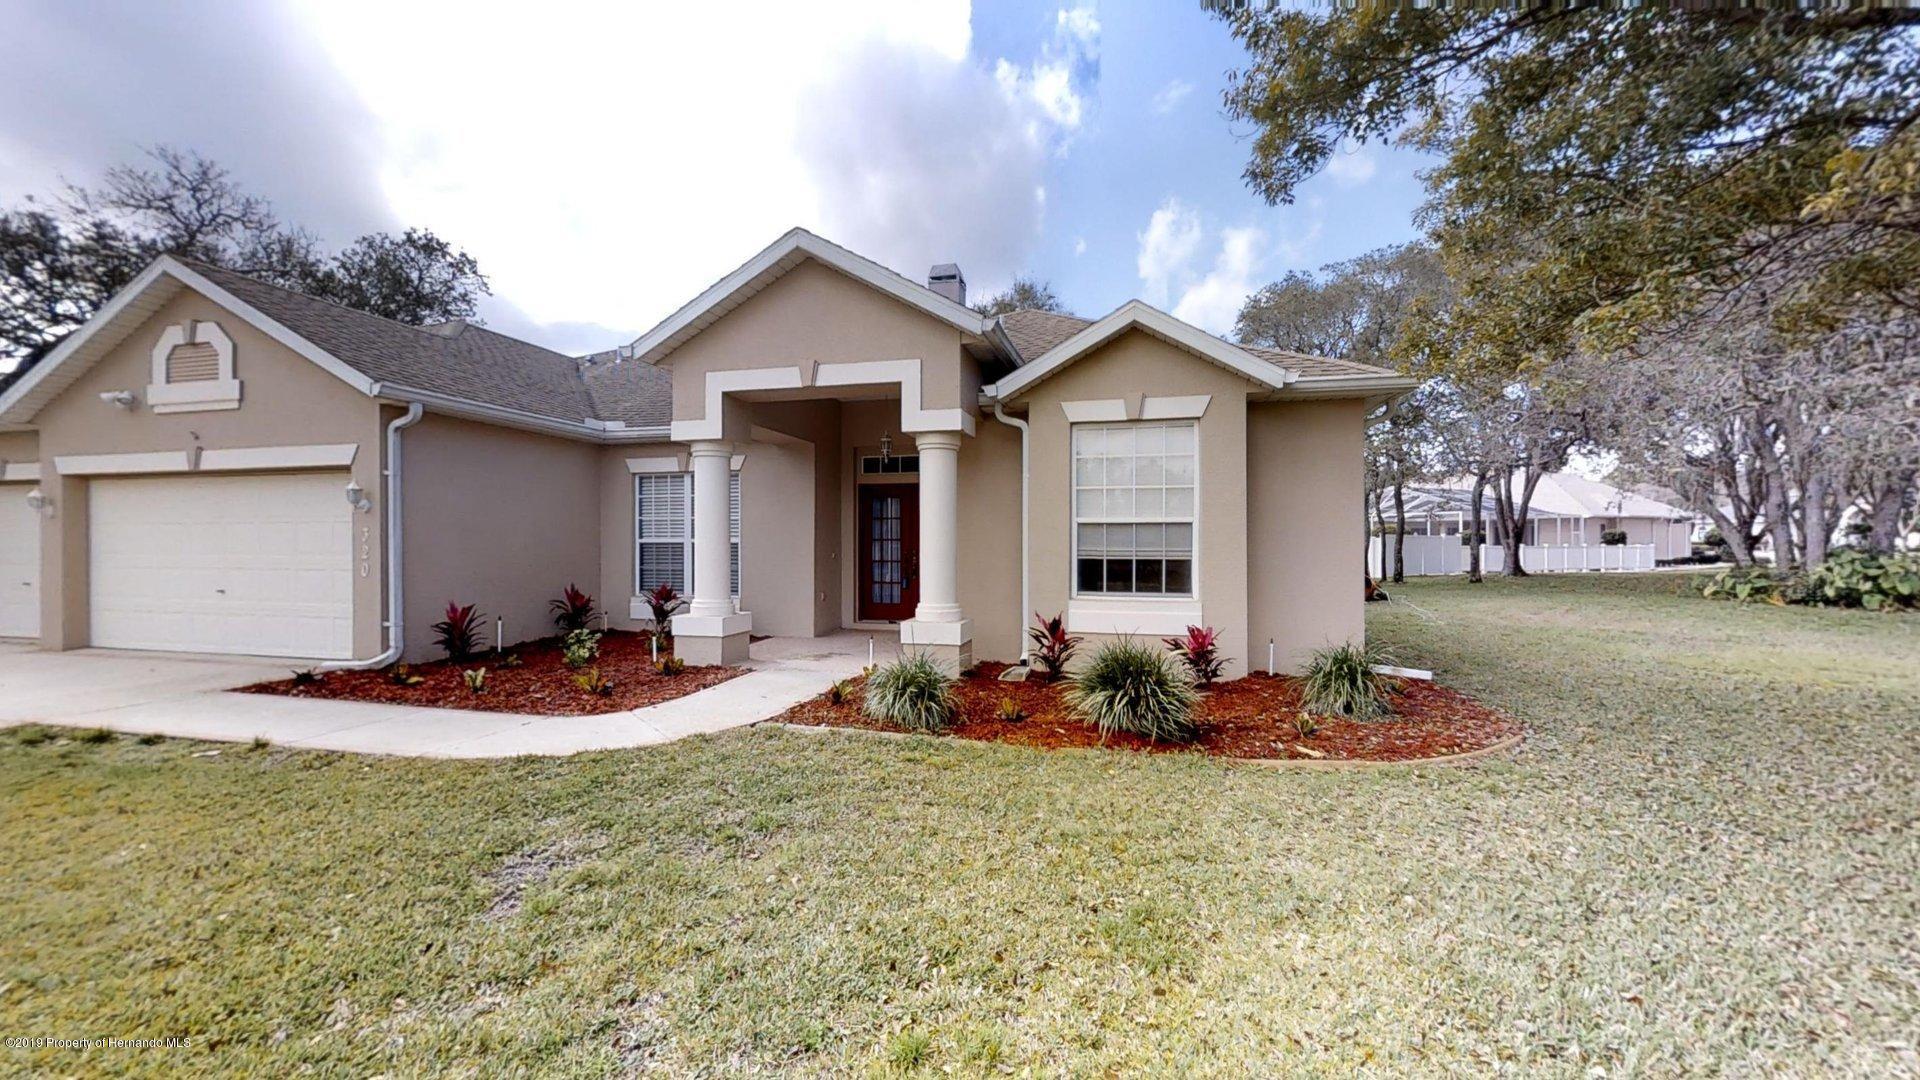 320 Cressida Circle, Spring Hill, Florida 34609, 3 Bedrooms Bedrooms, ,2 BathroomsBathrooms,Residential,For Sale,Cressida,2199043